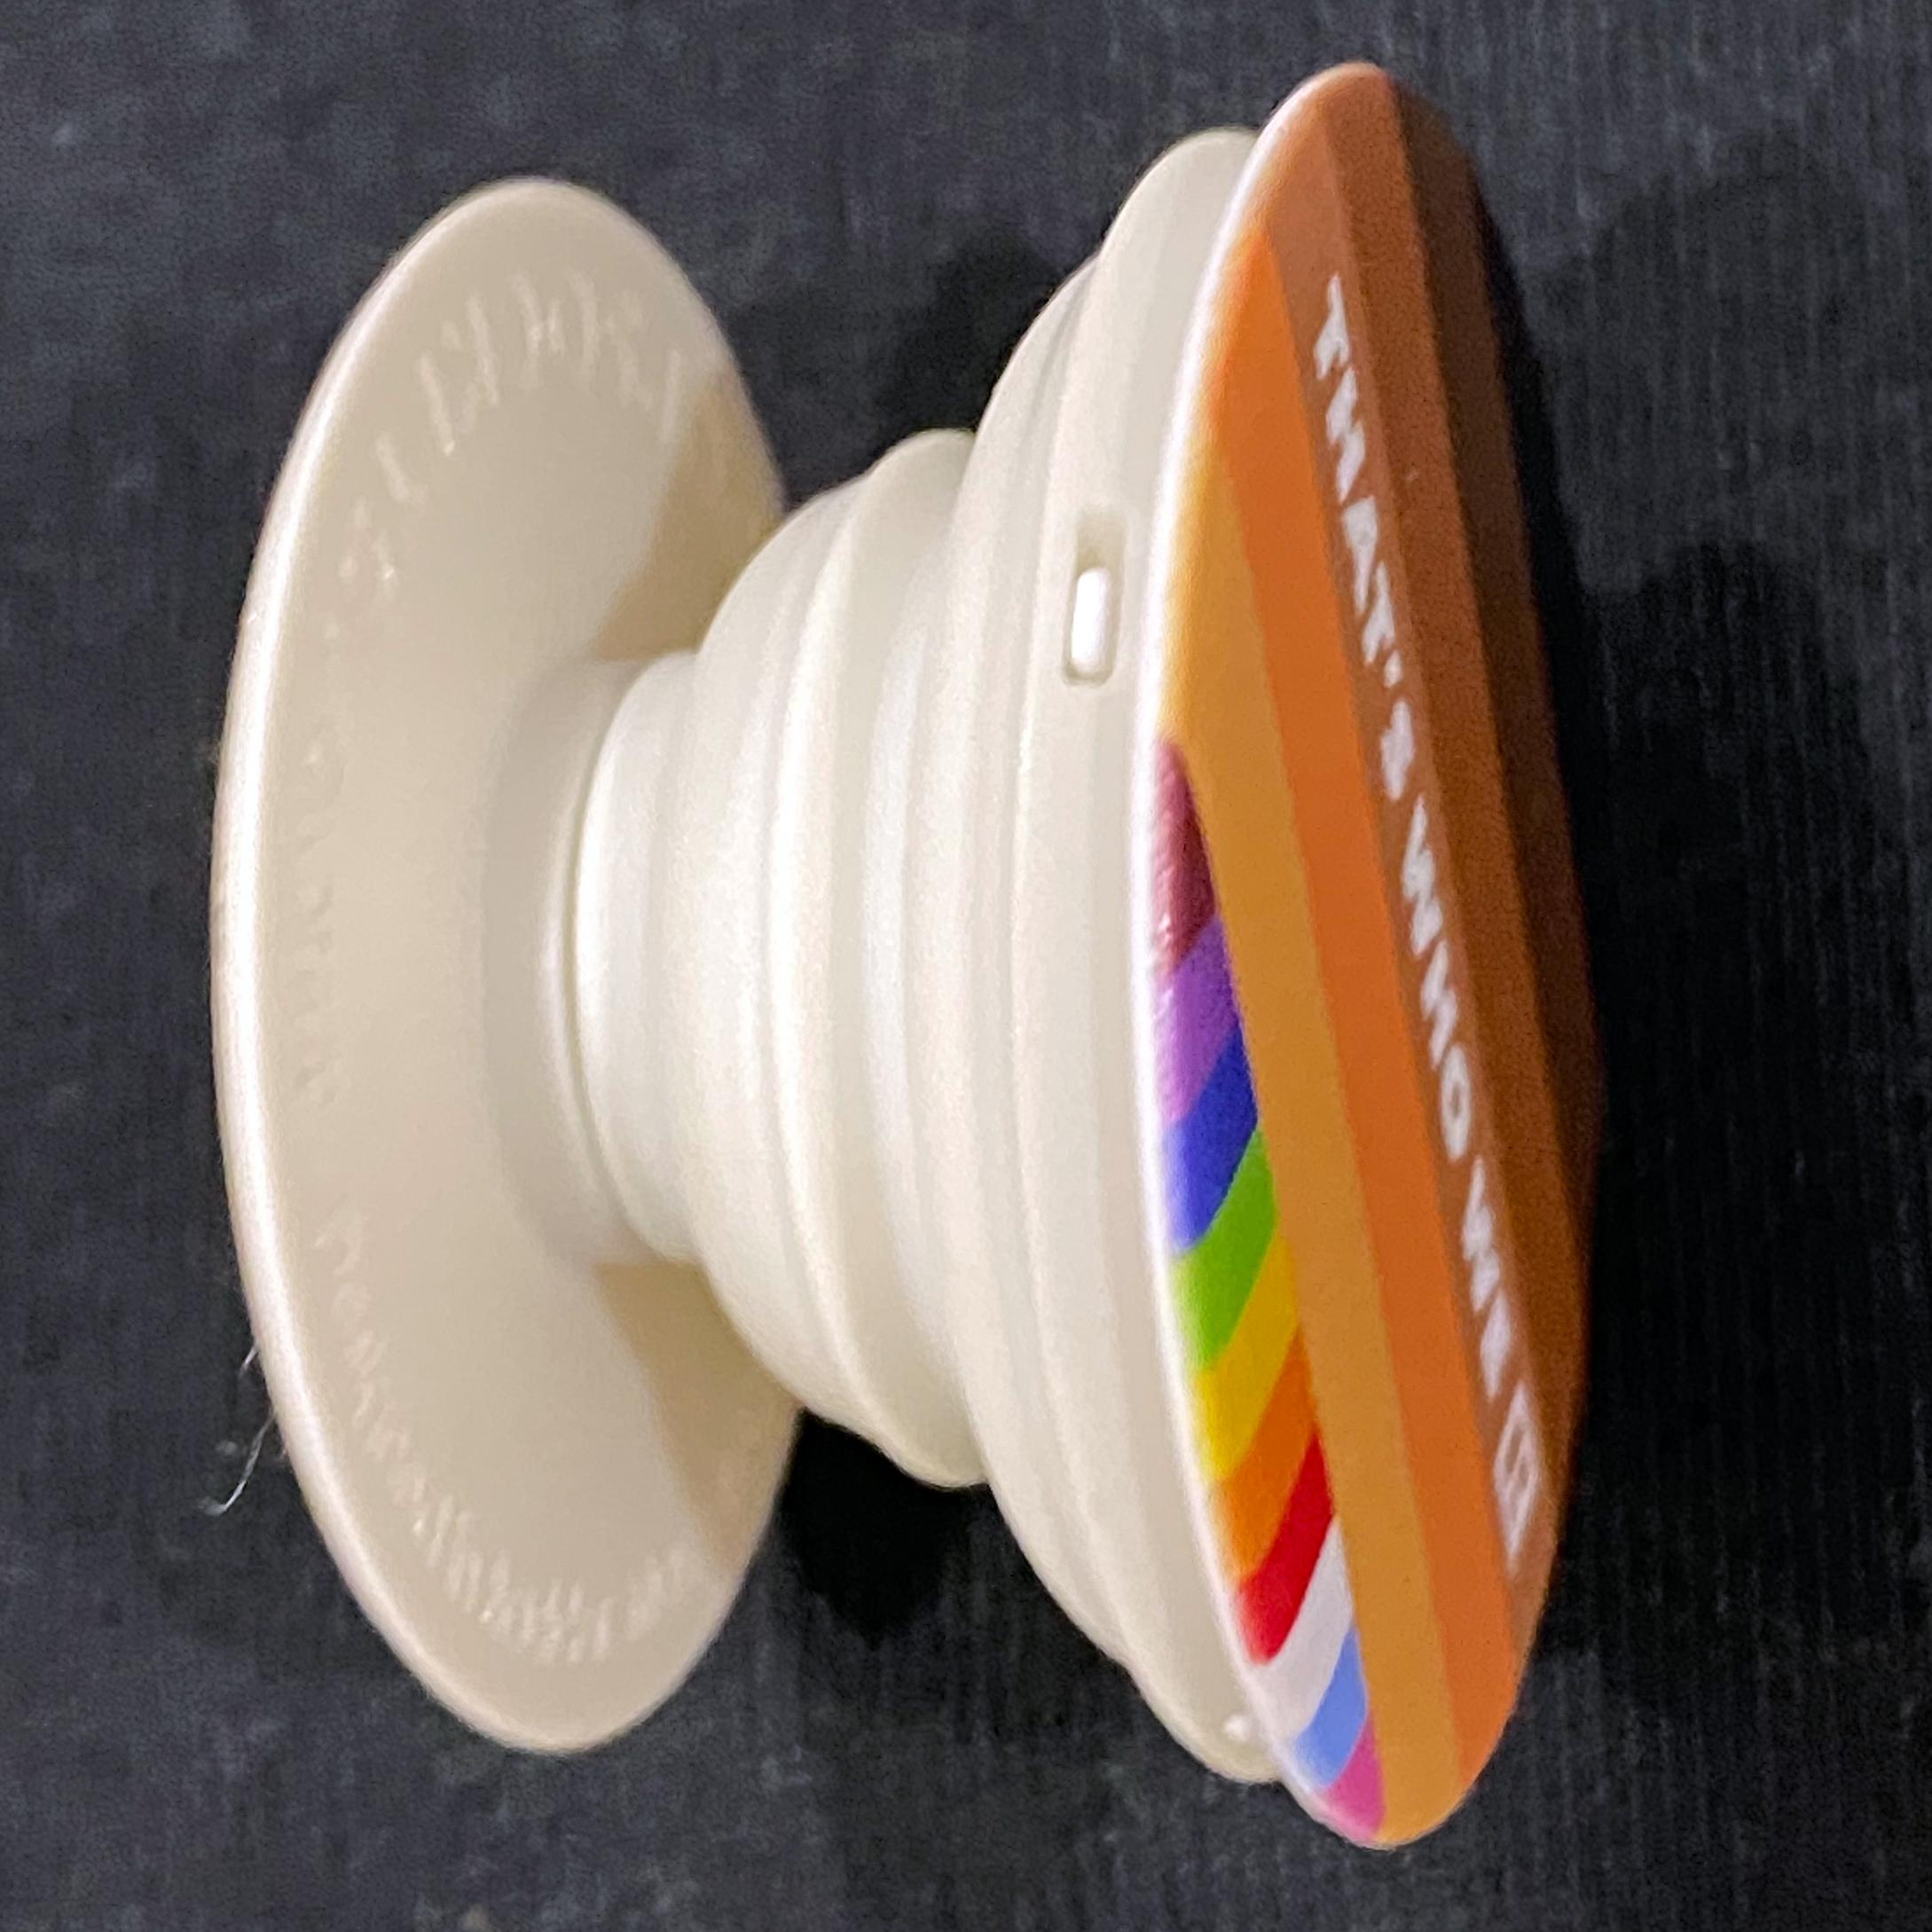 Fair Housing PopSocket - FH1005